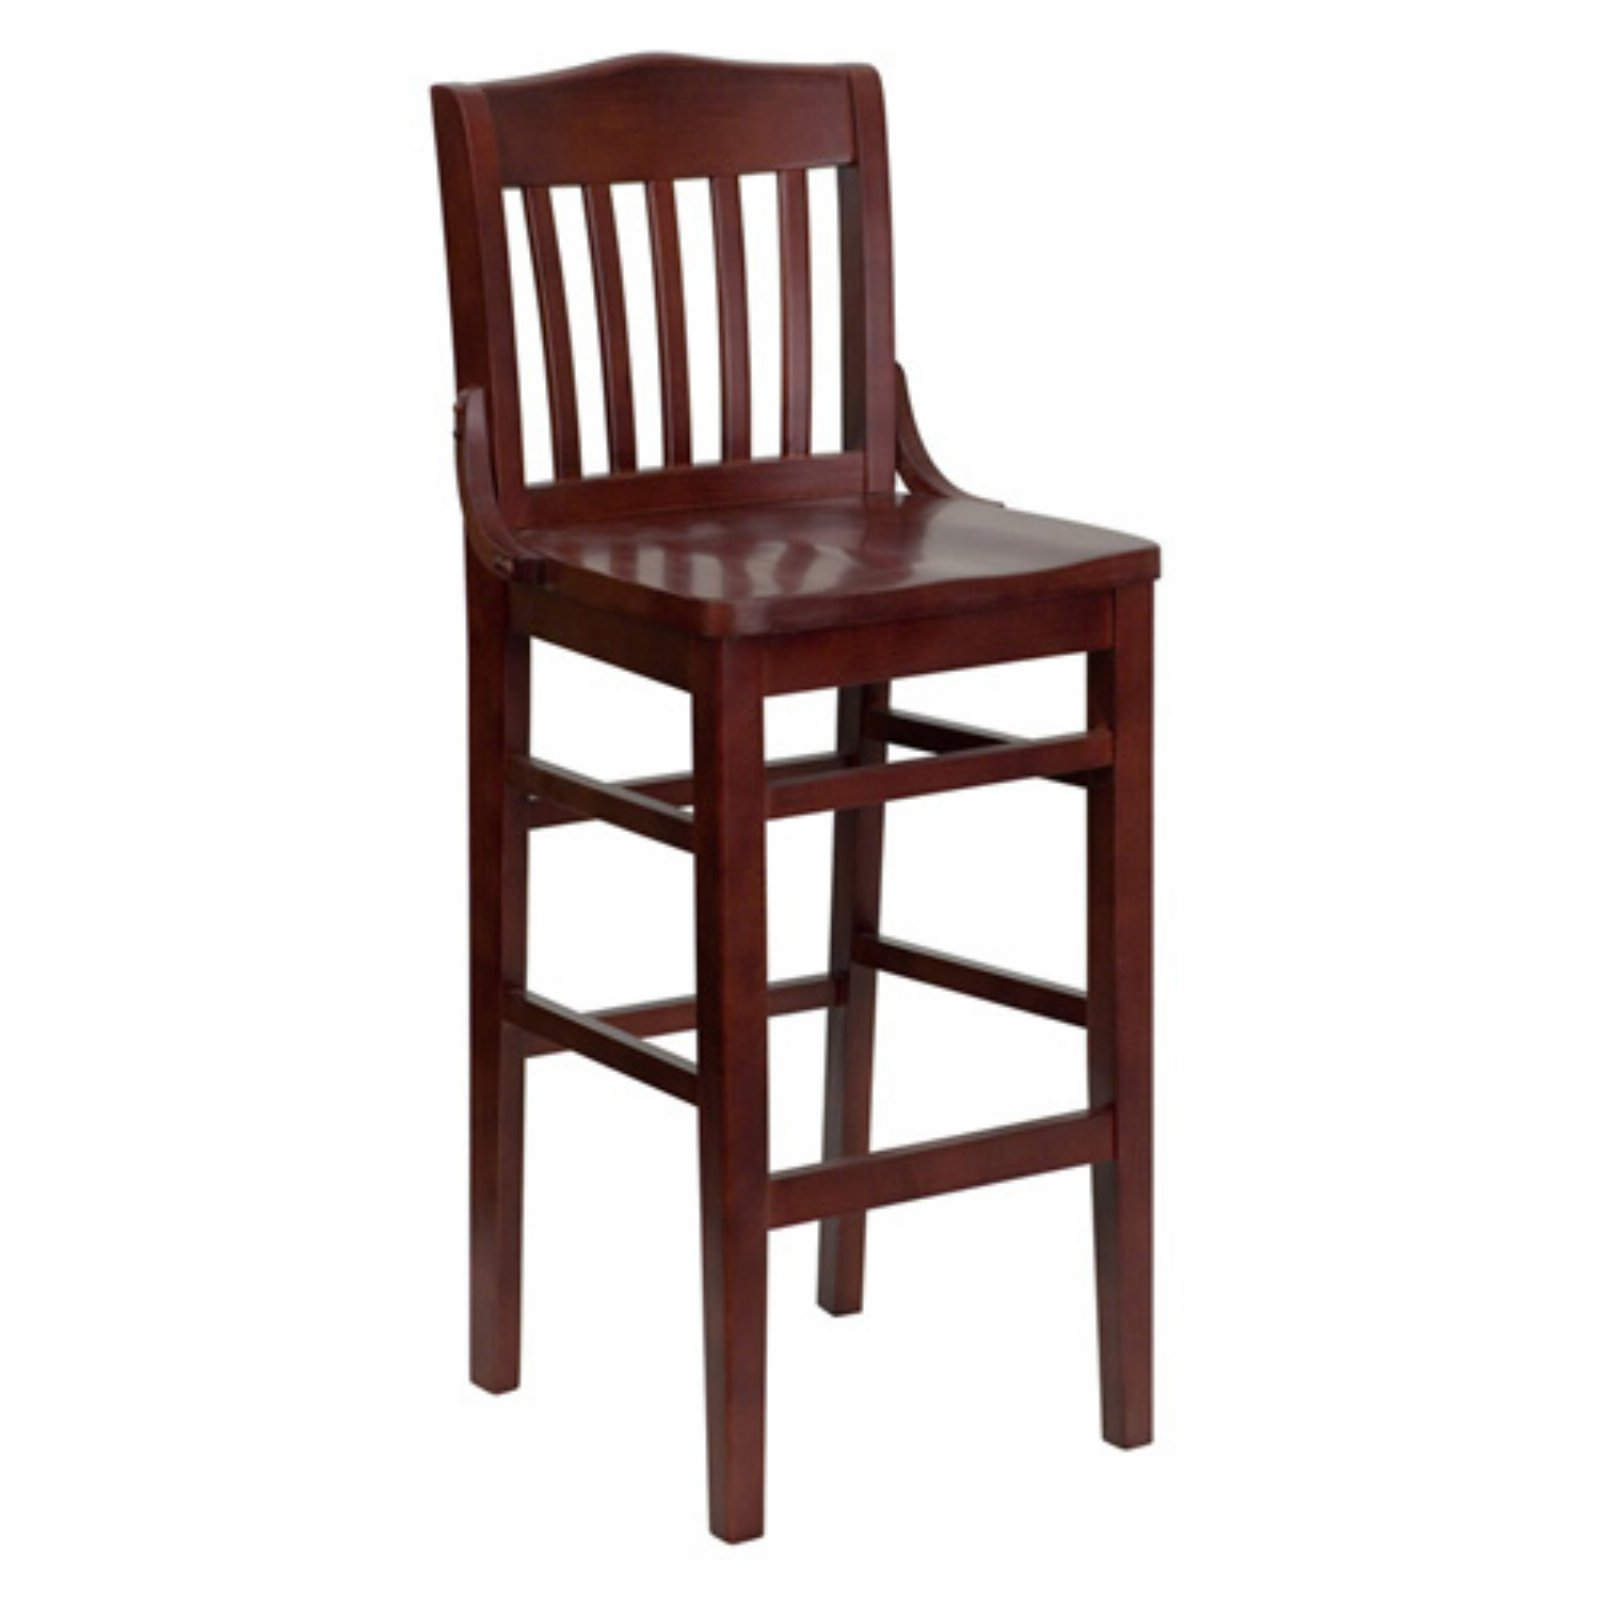 Flash Furniture HERCULES Series Mahogany Finished School House Back Wooden Restaurant Barstool